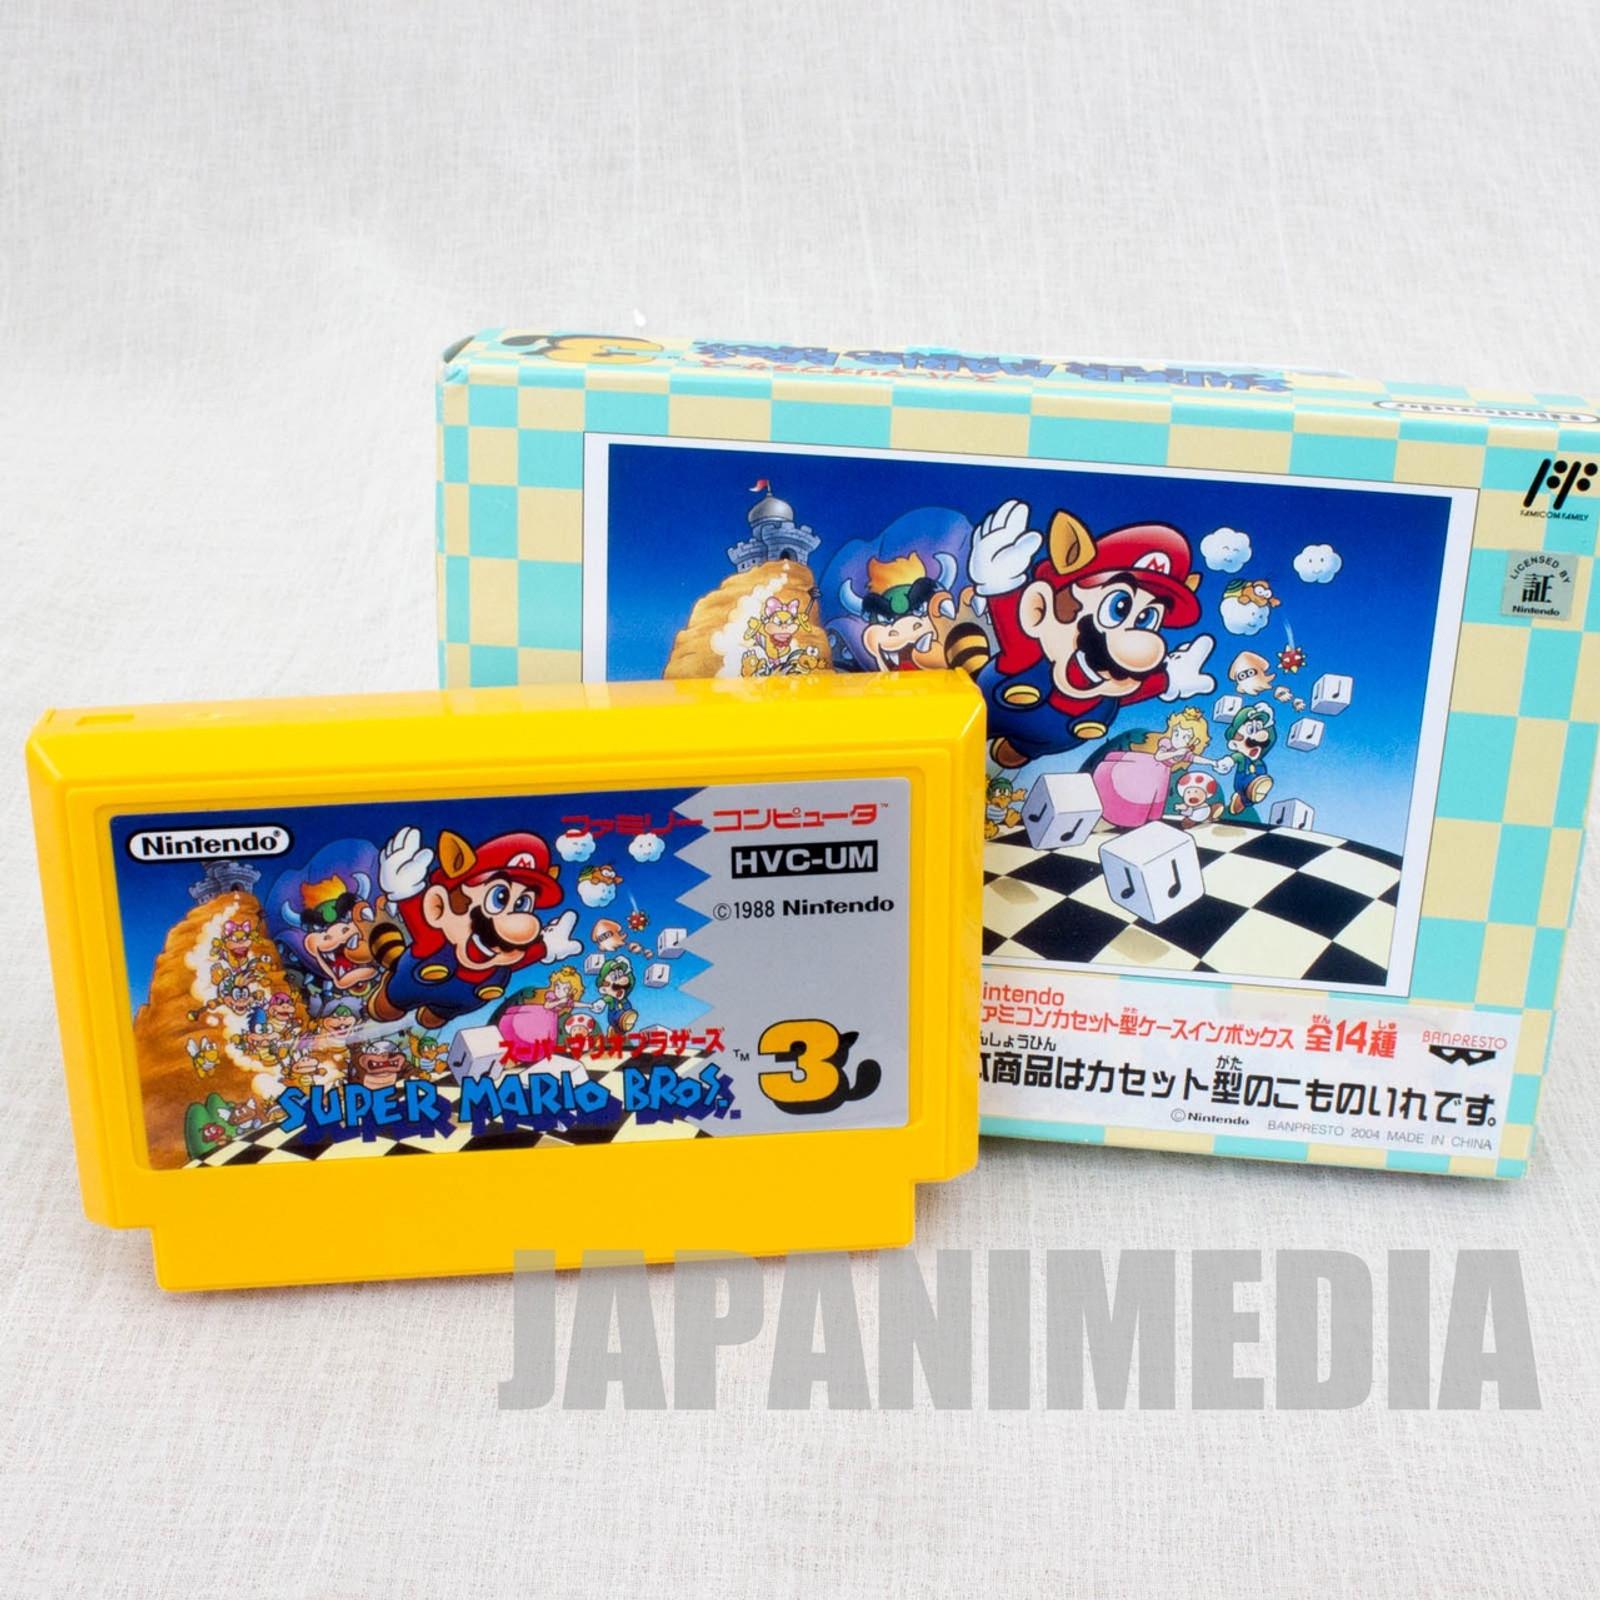 Super Mario Bros. 3 Cassette type Accessory Case Banpresto JAPAN Nintendo